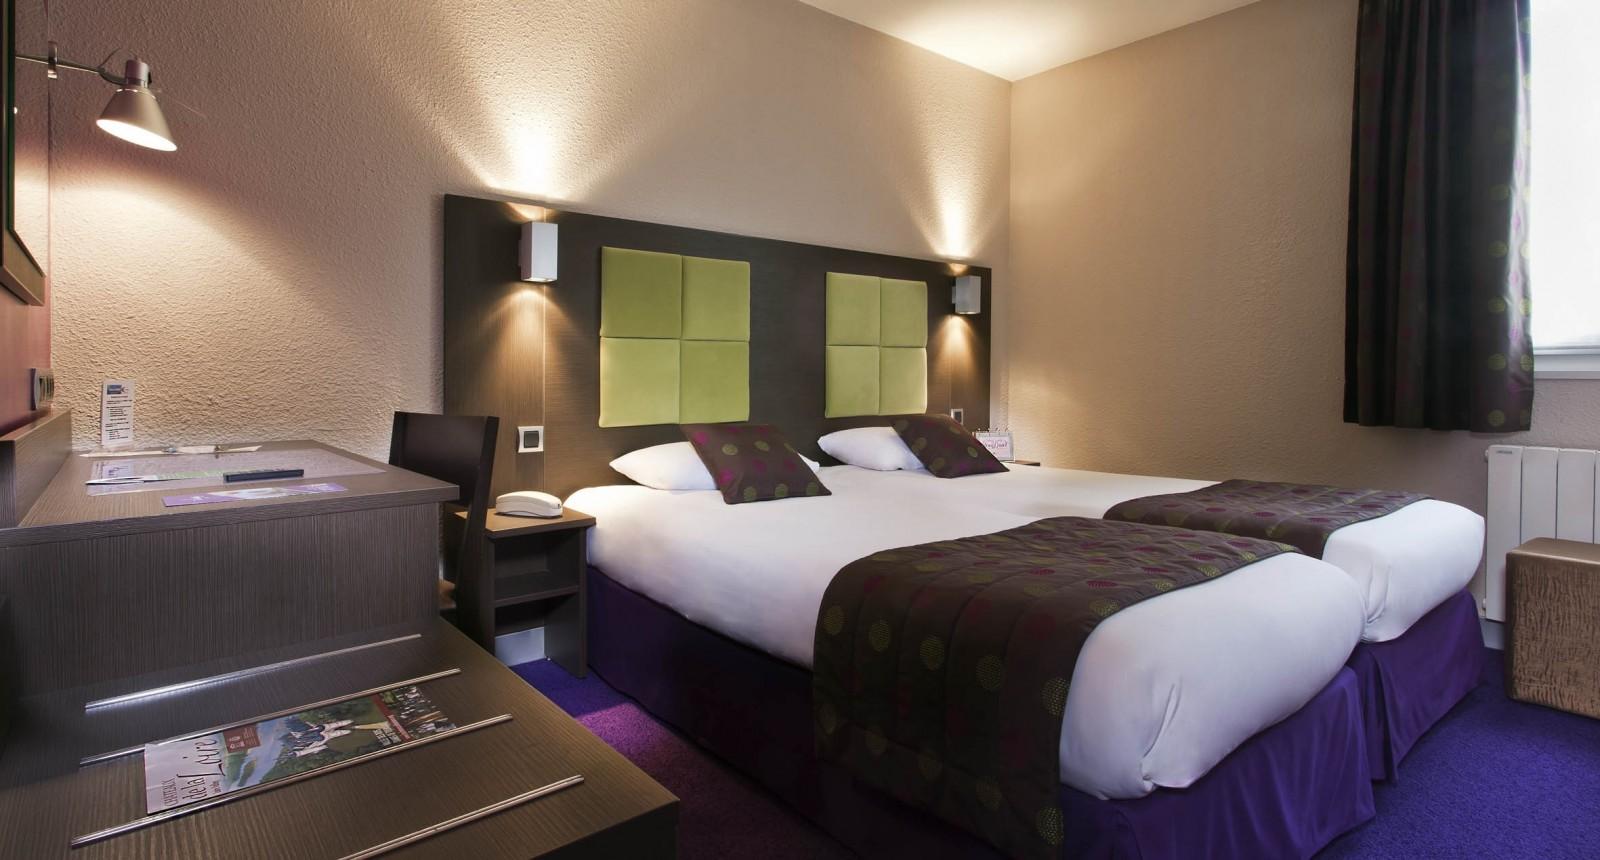 TourHôtel Blois *** | Hotel Valle della Loira | Camere ...